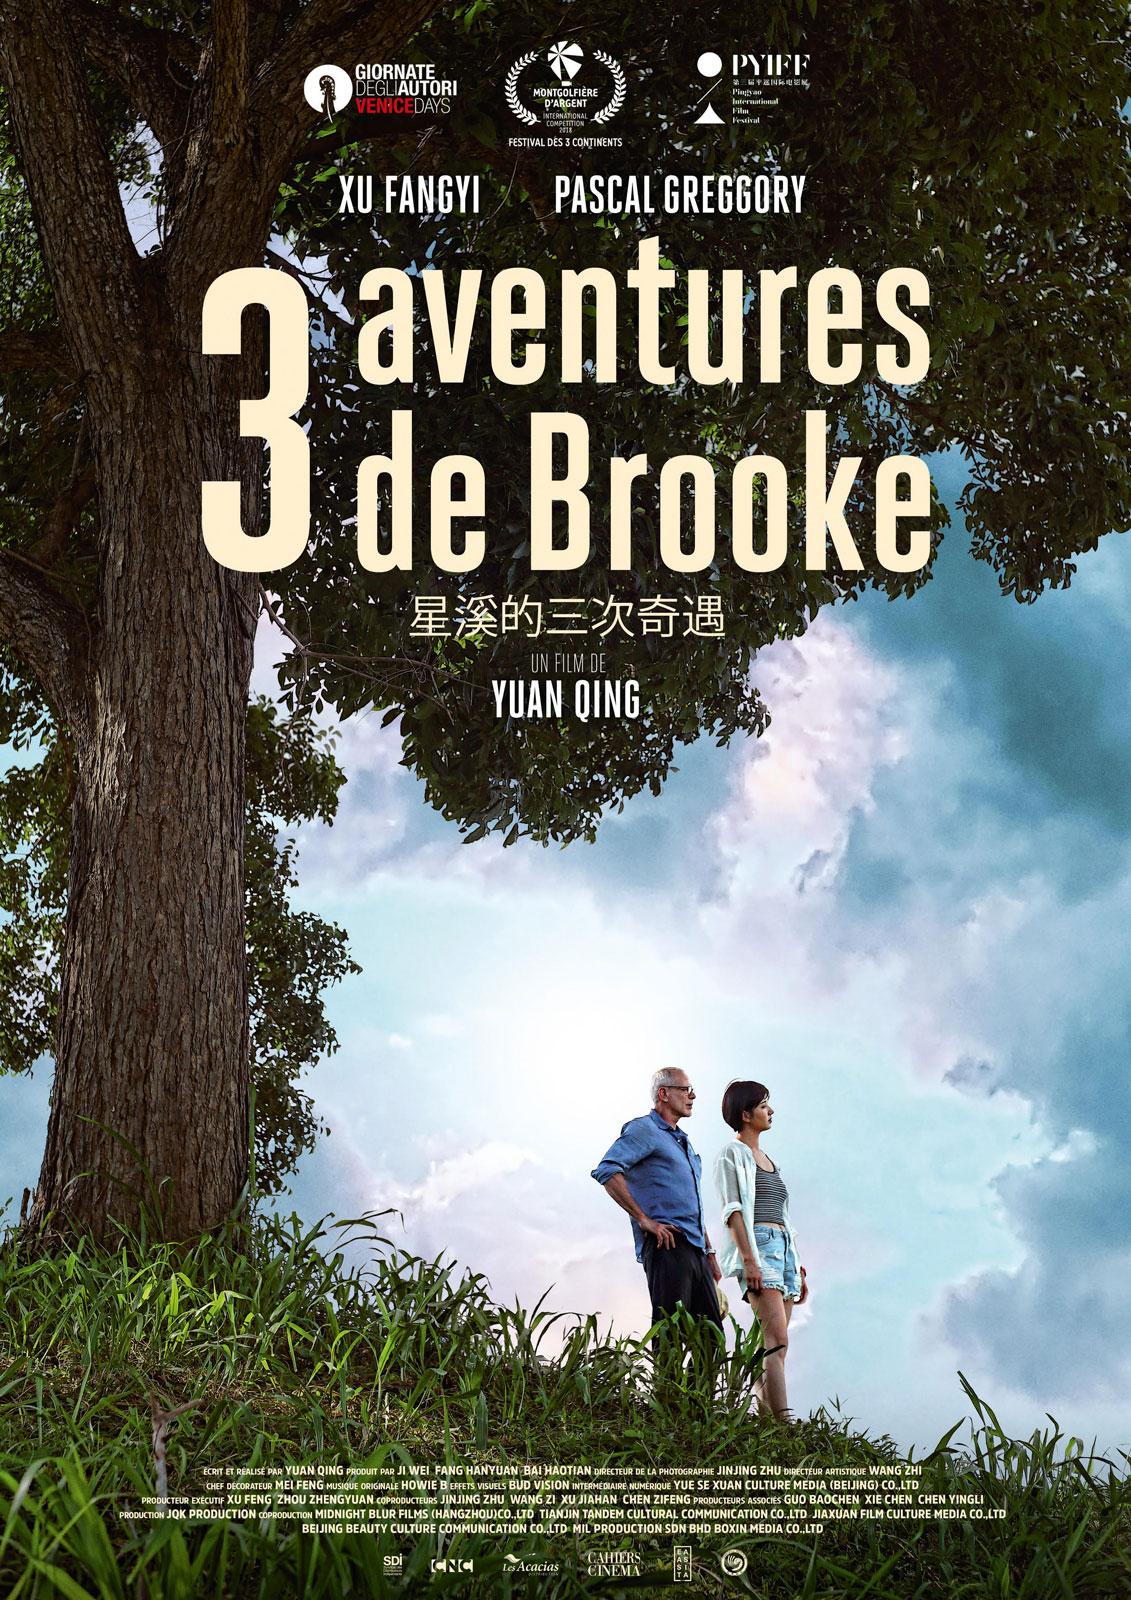 3 Aventures de Brooke - film 2018 - AlloCiné